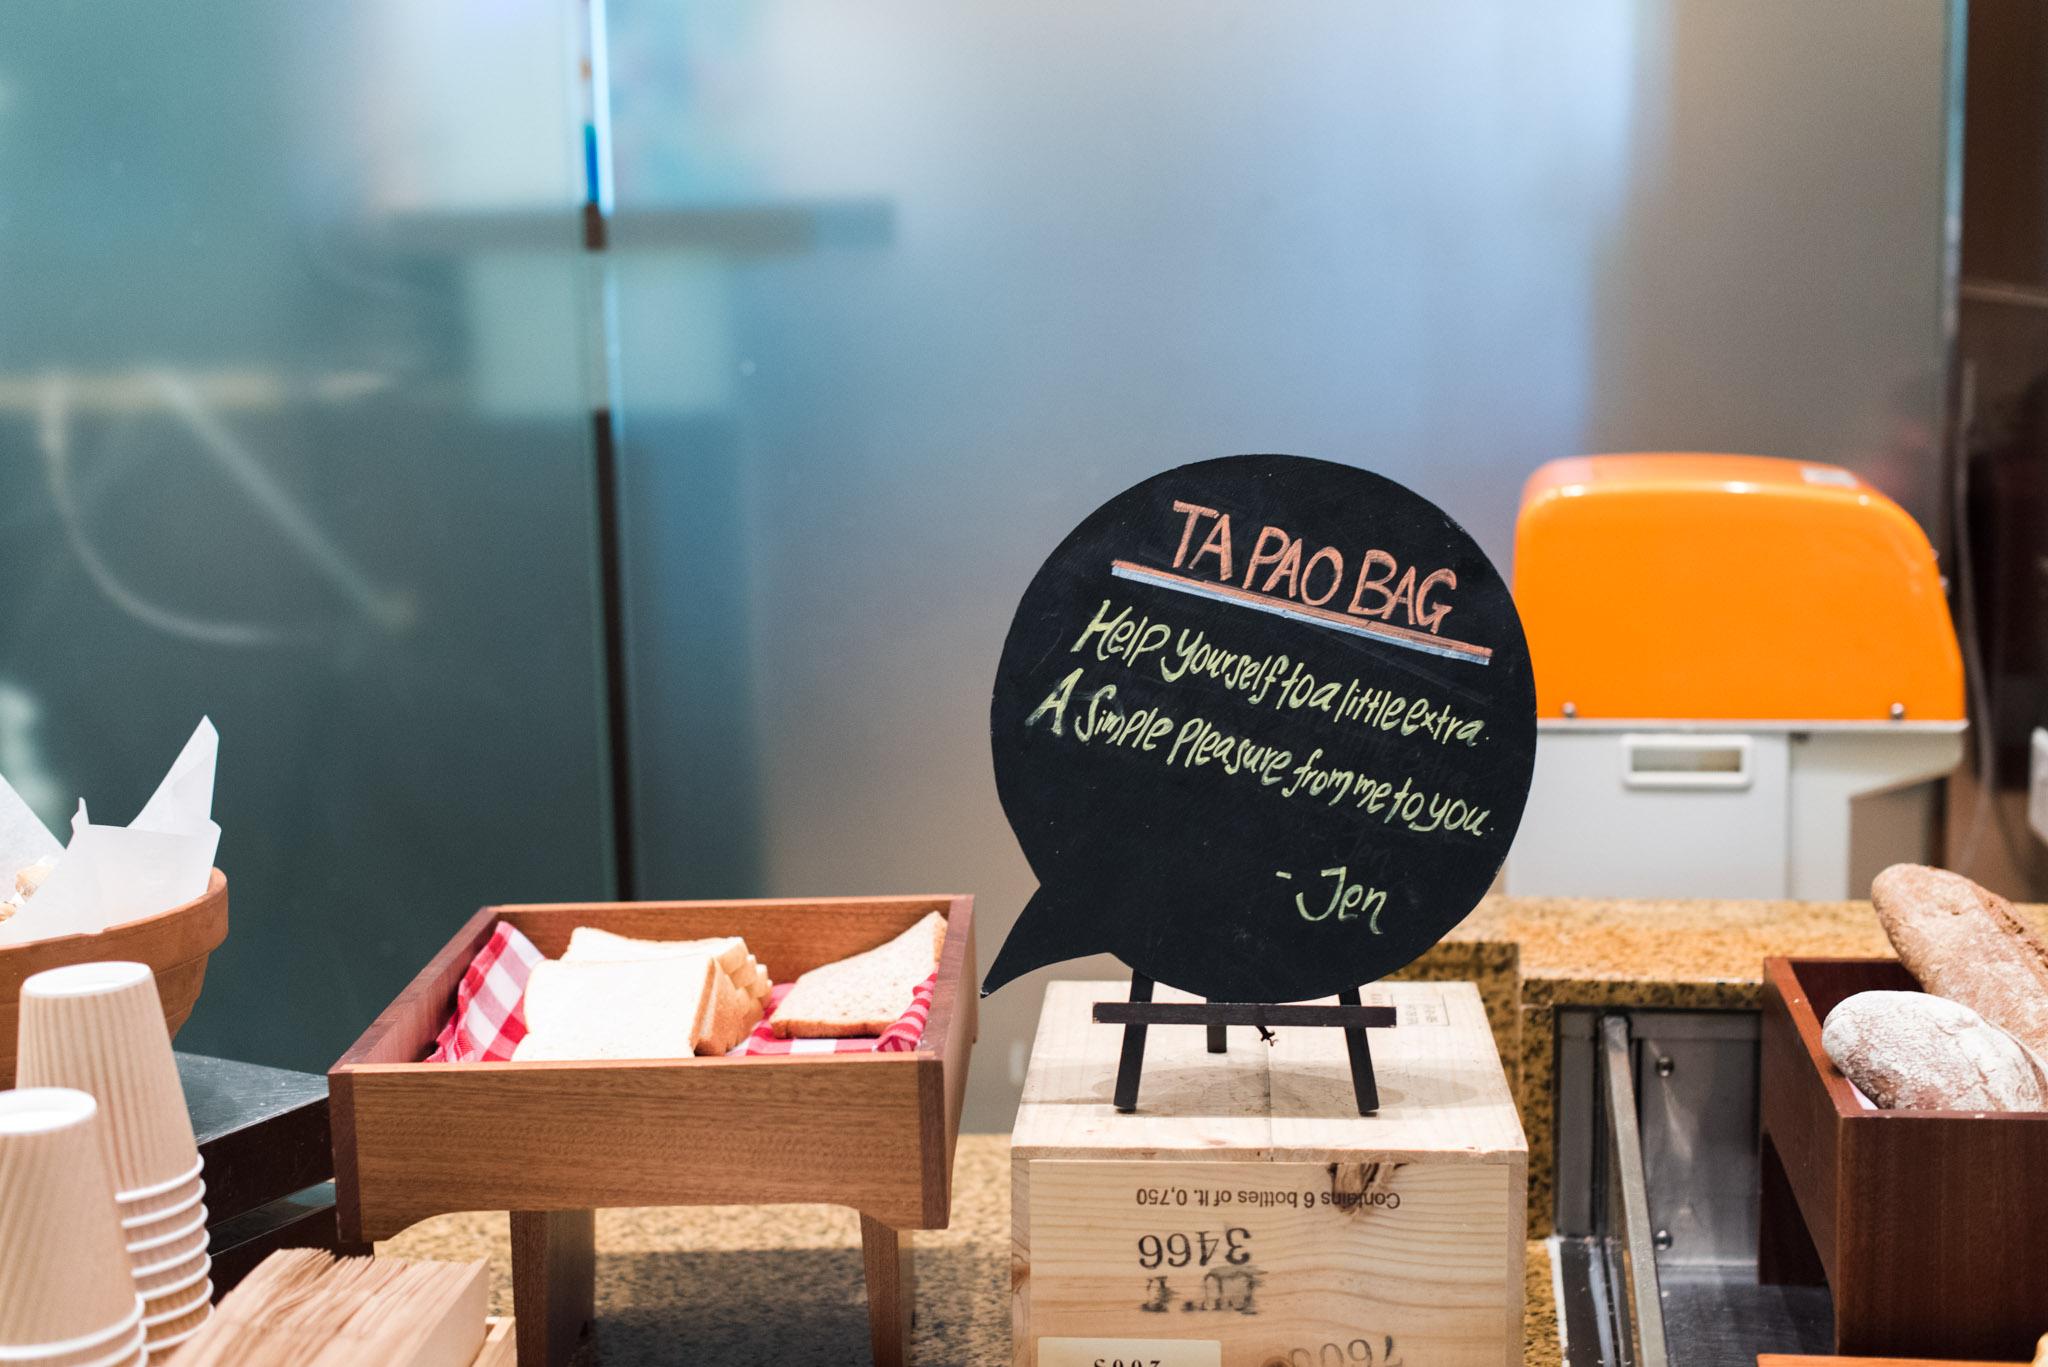 Tapao Bag at Cafebiz (Hotel Jen Tanglin)